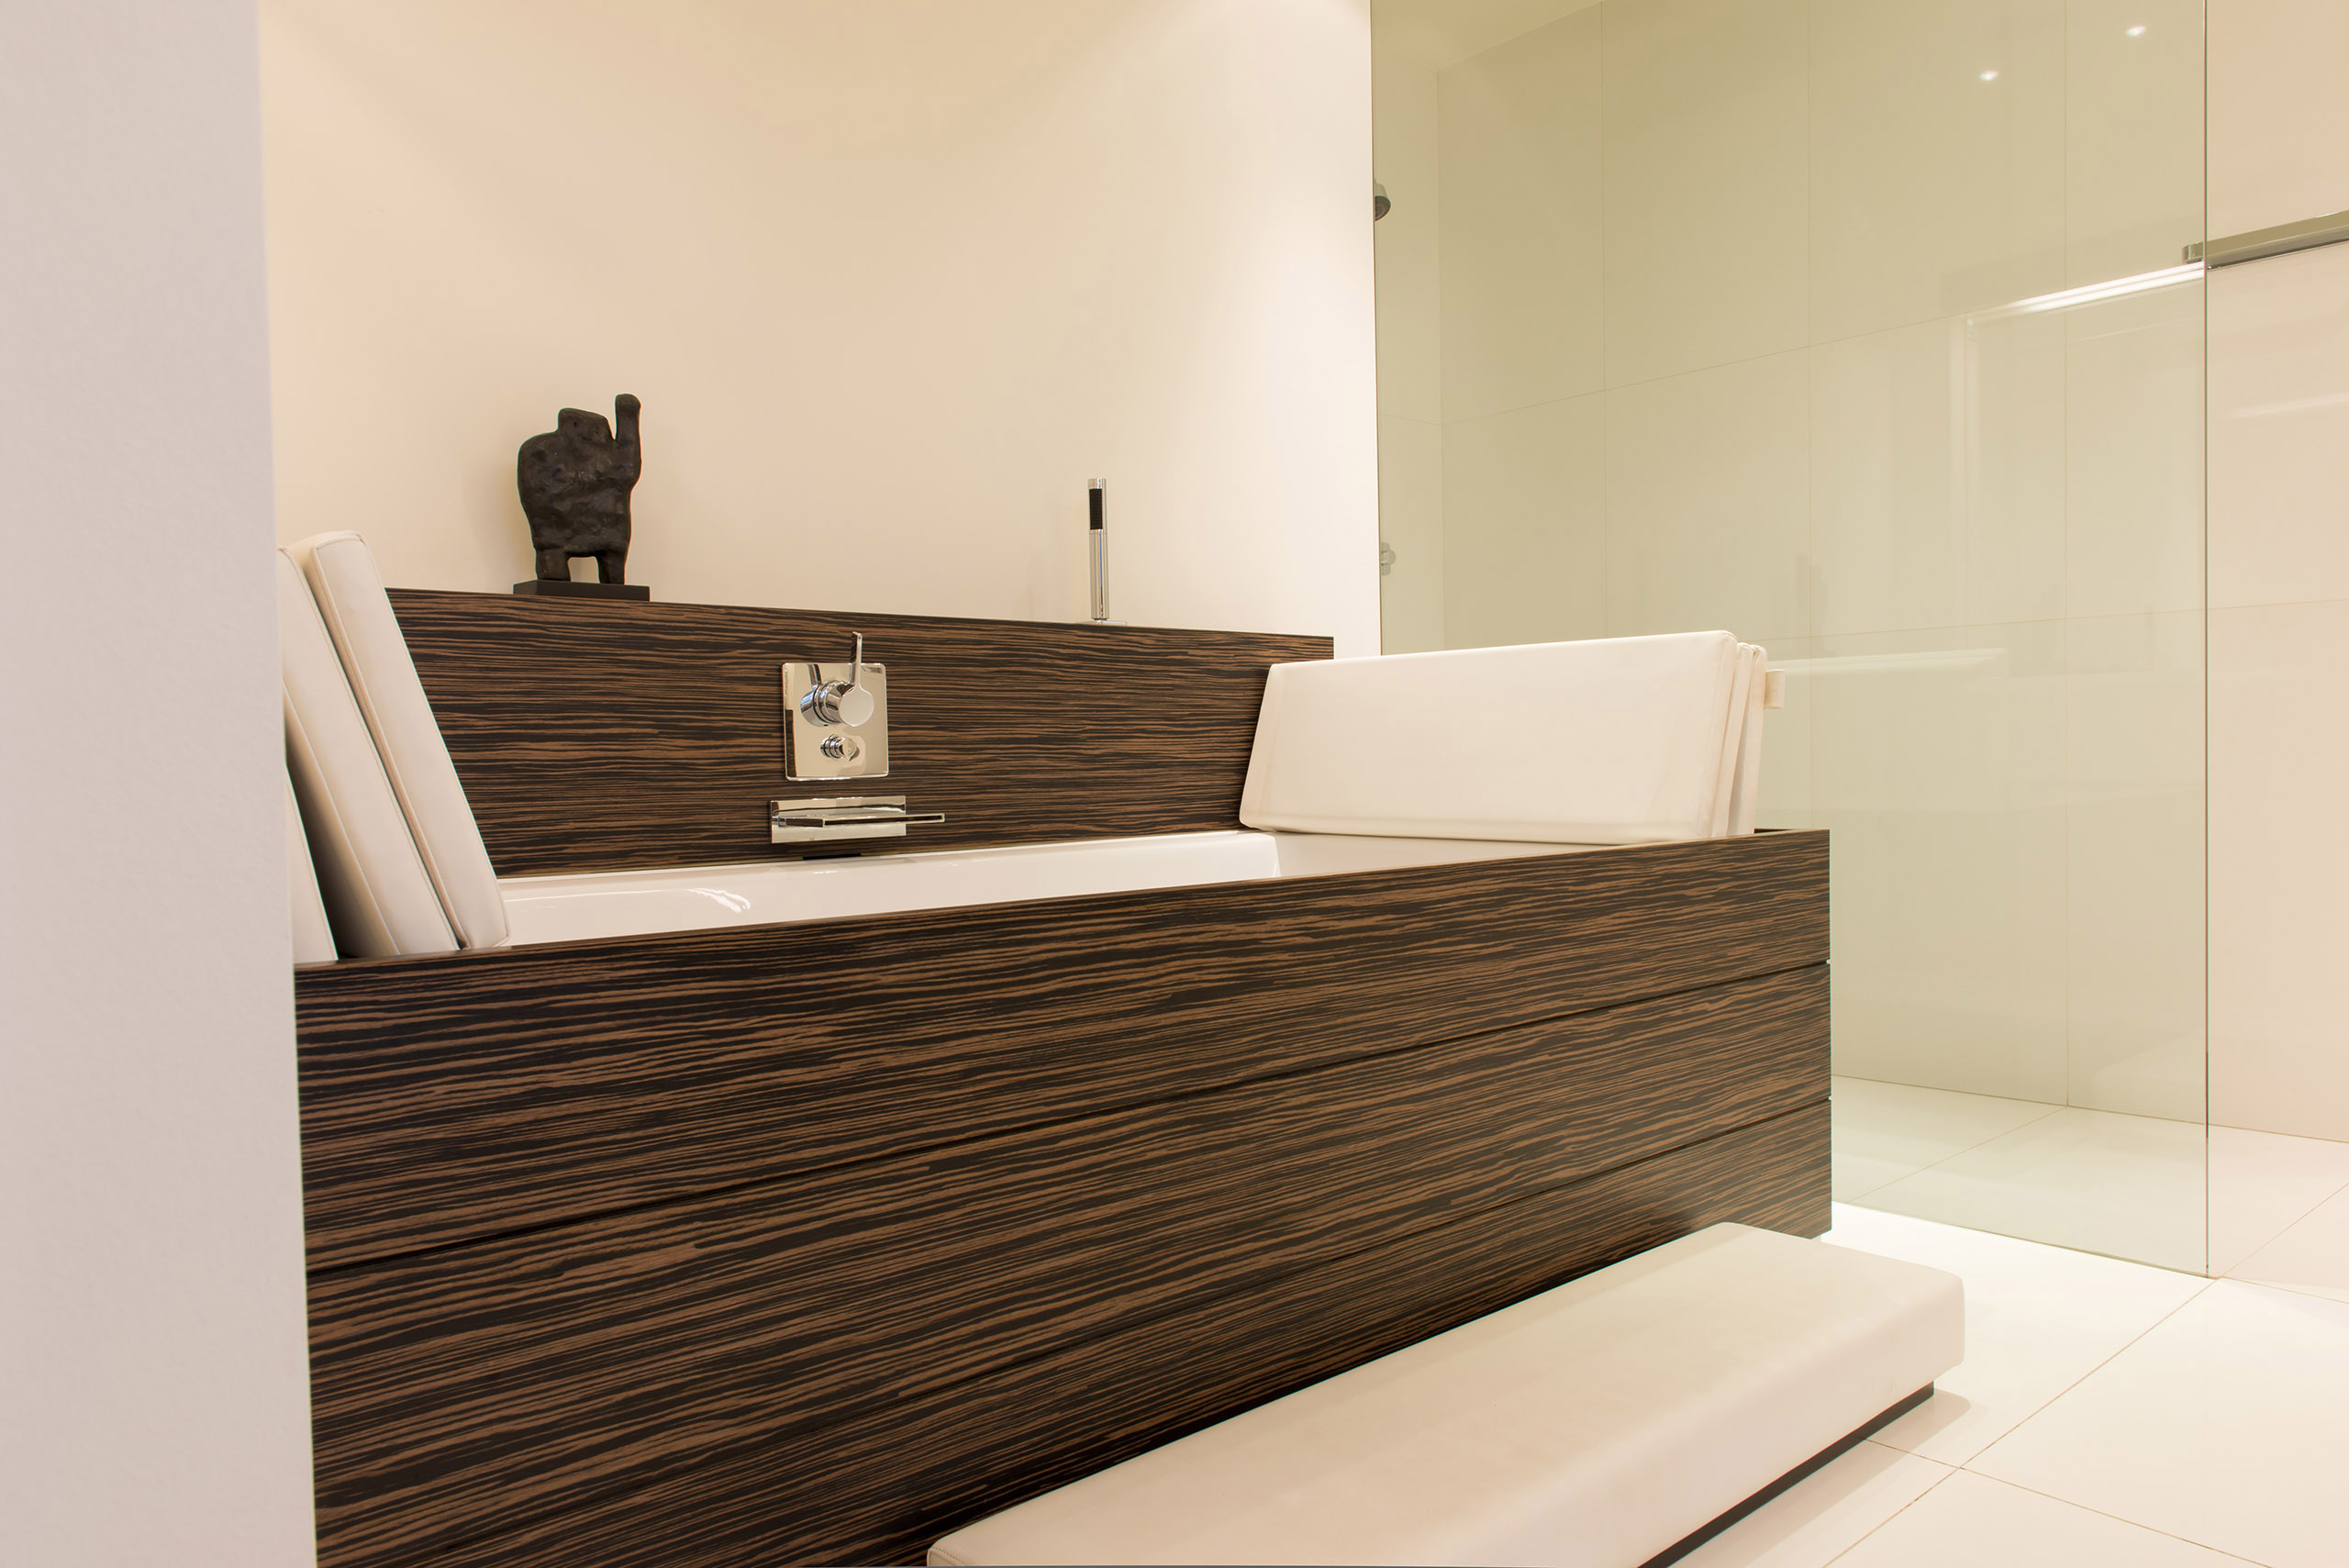 Bad volledig uitgewerkt